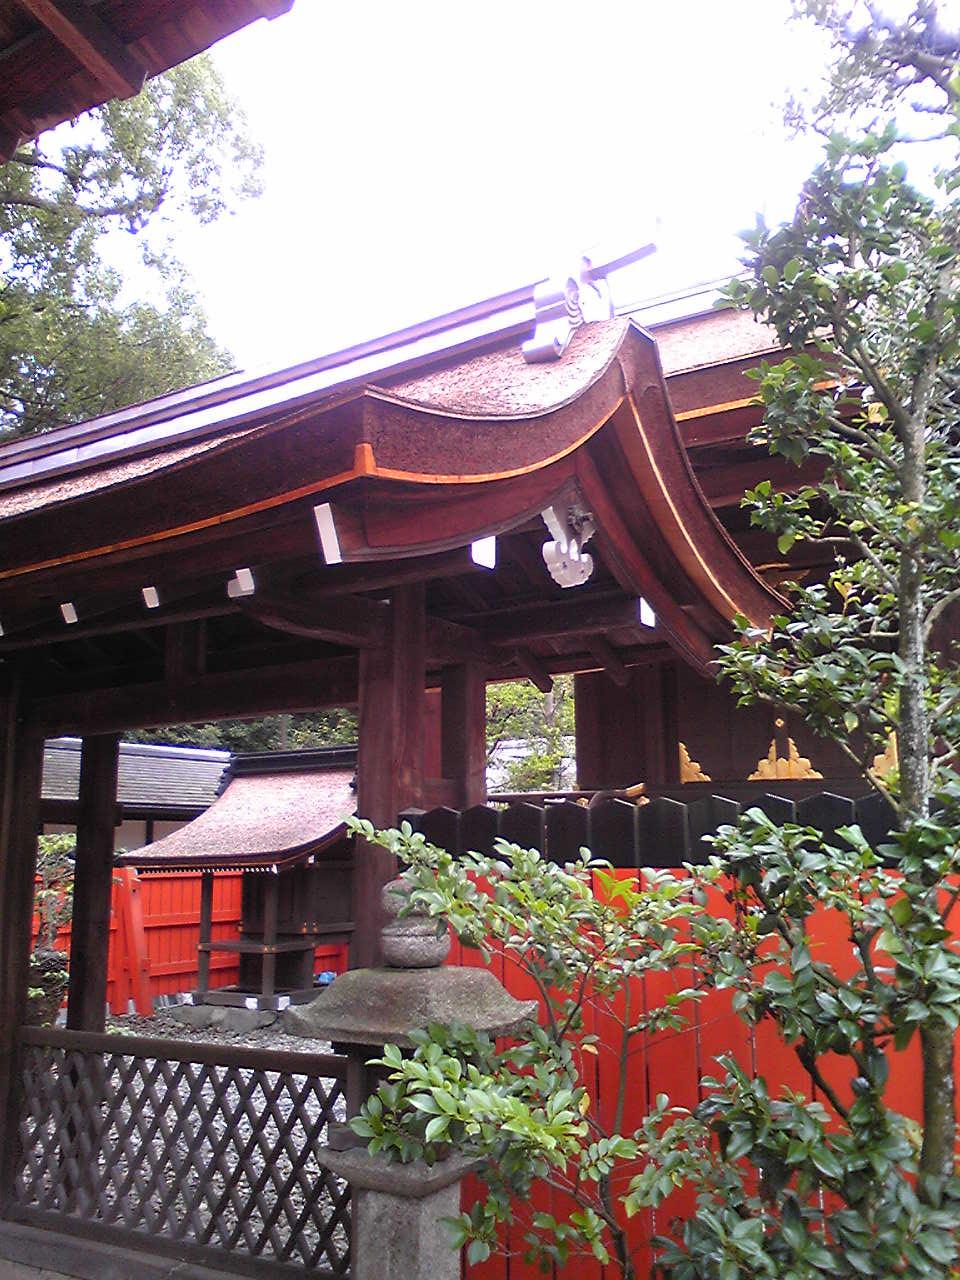 izumono shrine